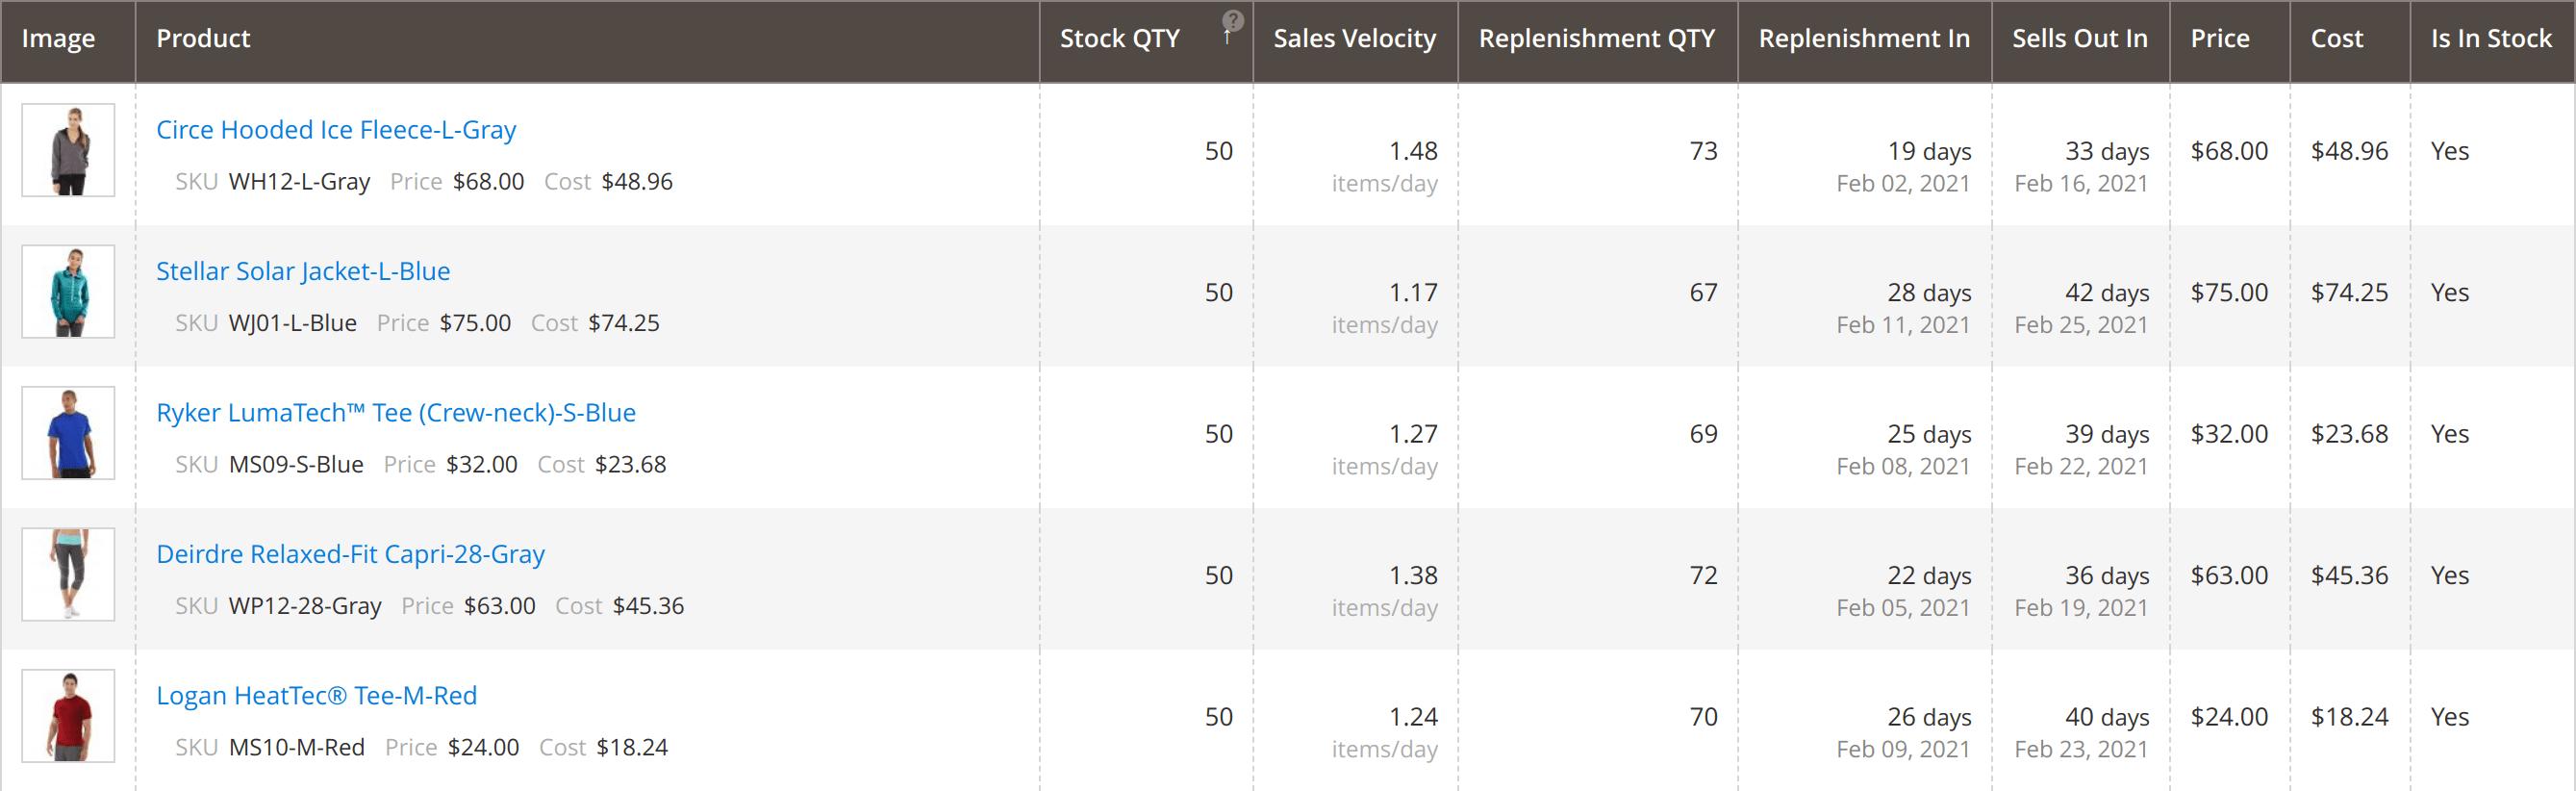 Replenishment grid in Mirasvit Magento 2 Inventory Planner module.